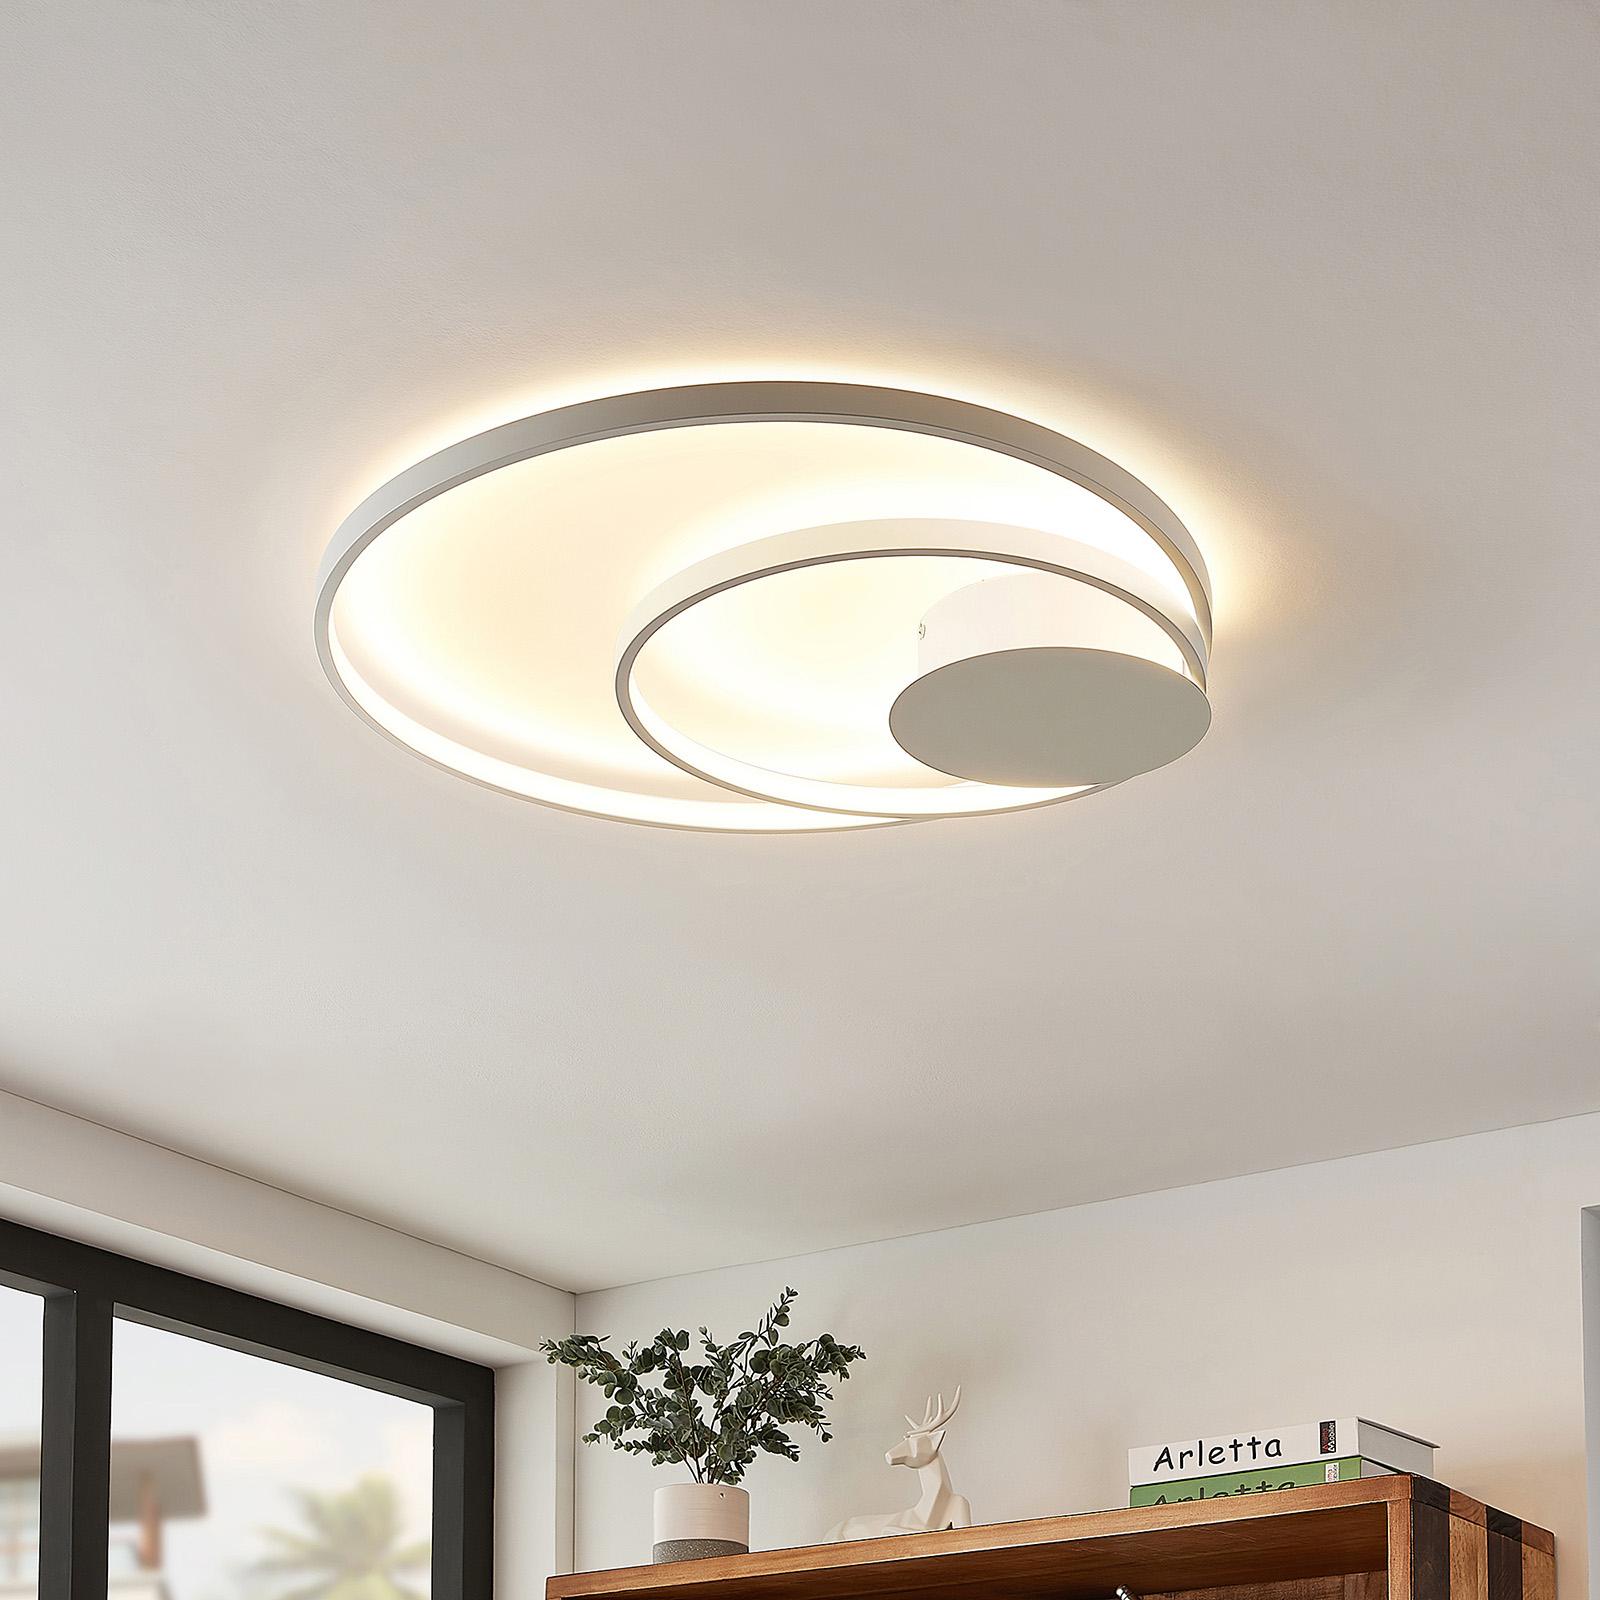 Lindby Nerwin LED plafondlamp, rond, wit